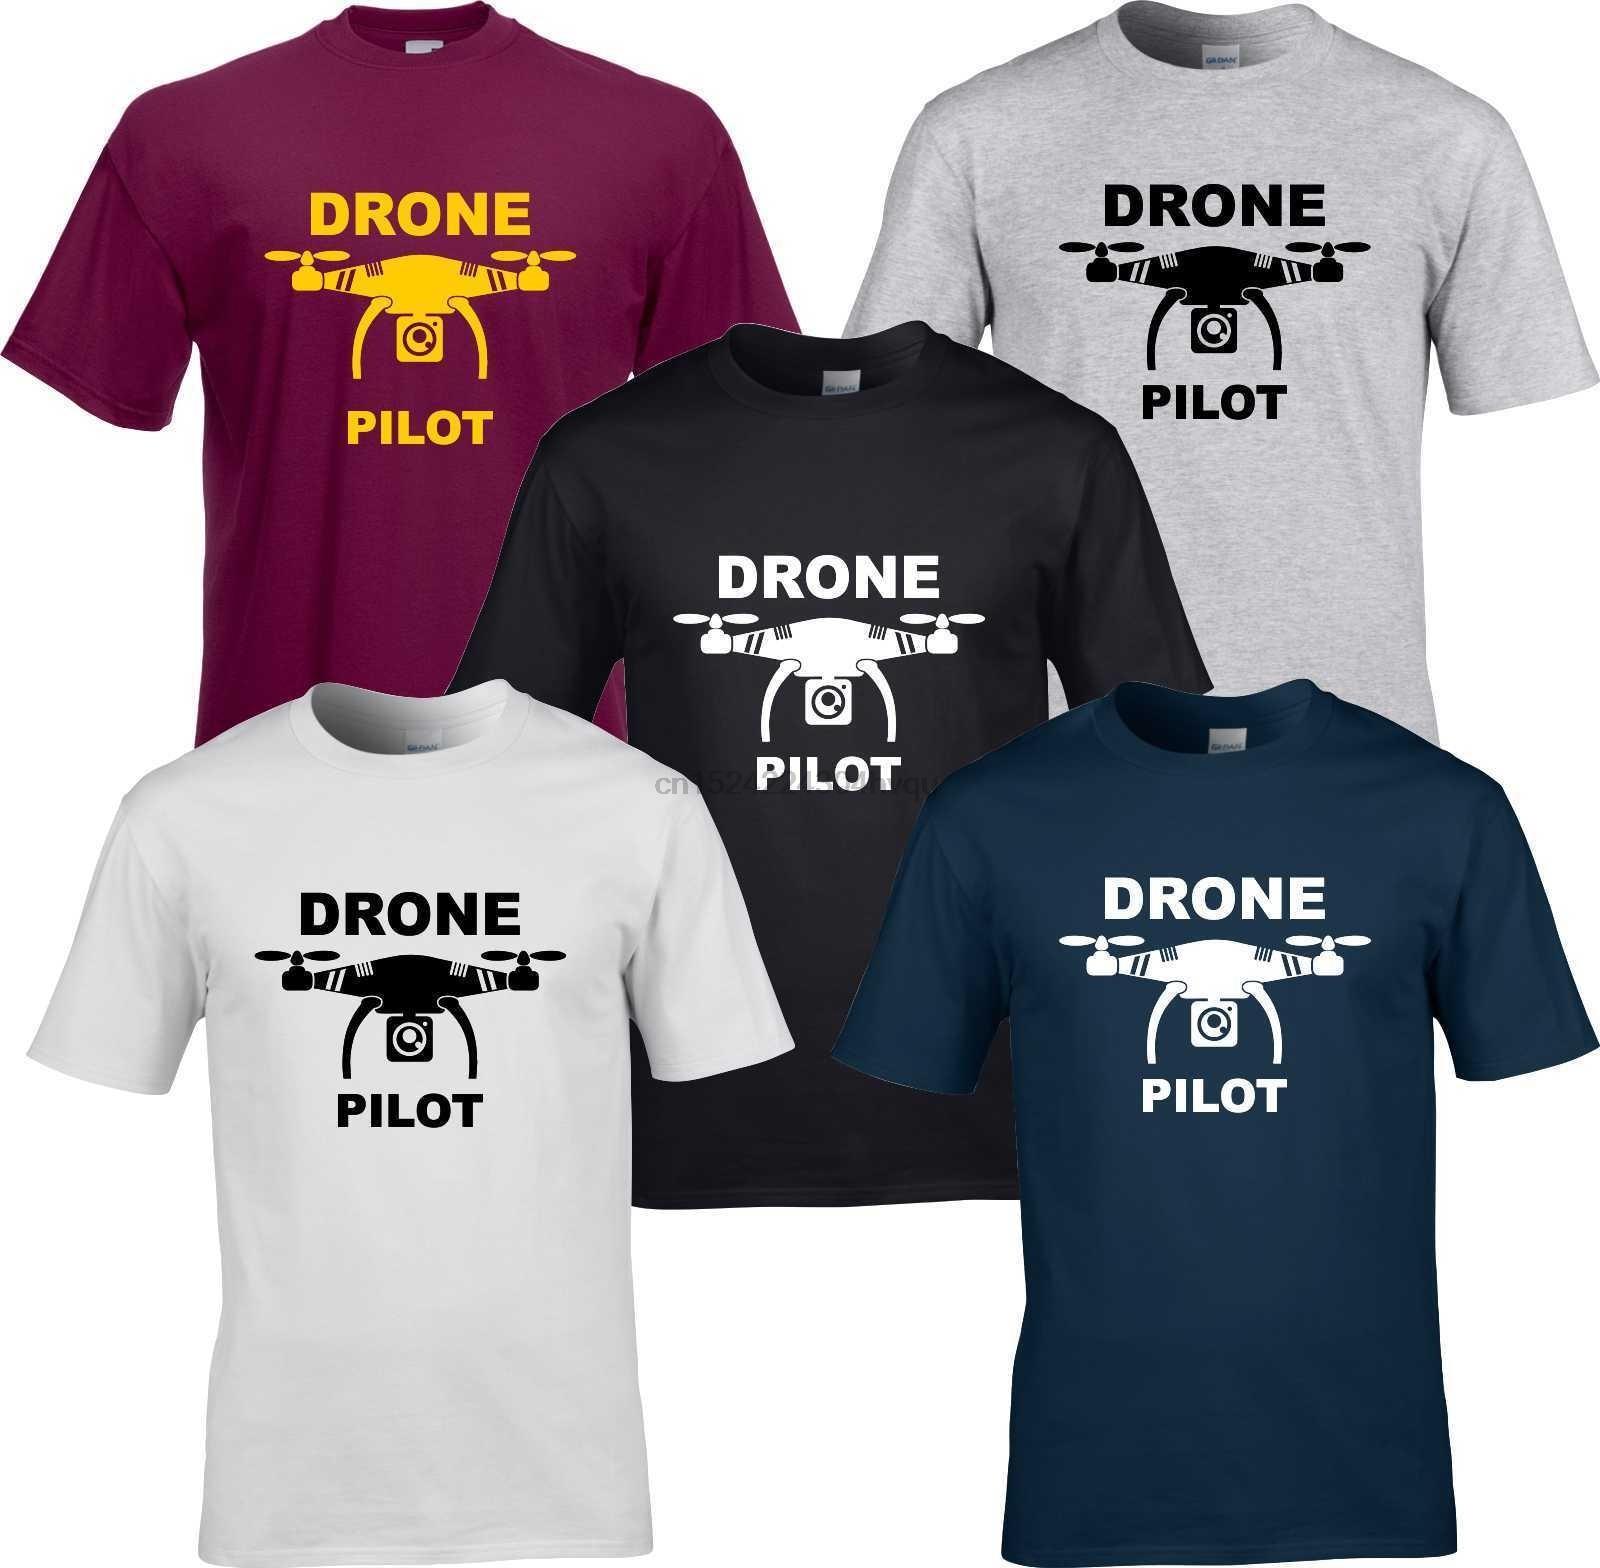 Drone pilot hombres camiseta unisex quadcopter